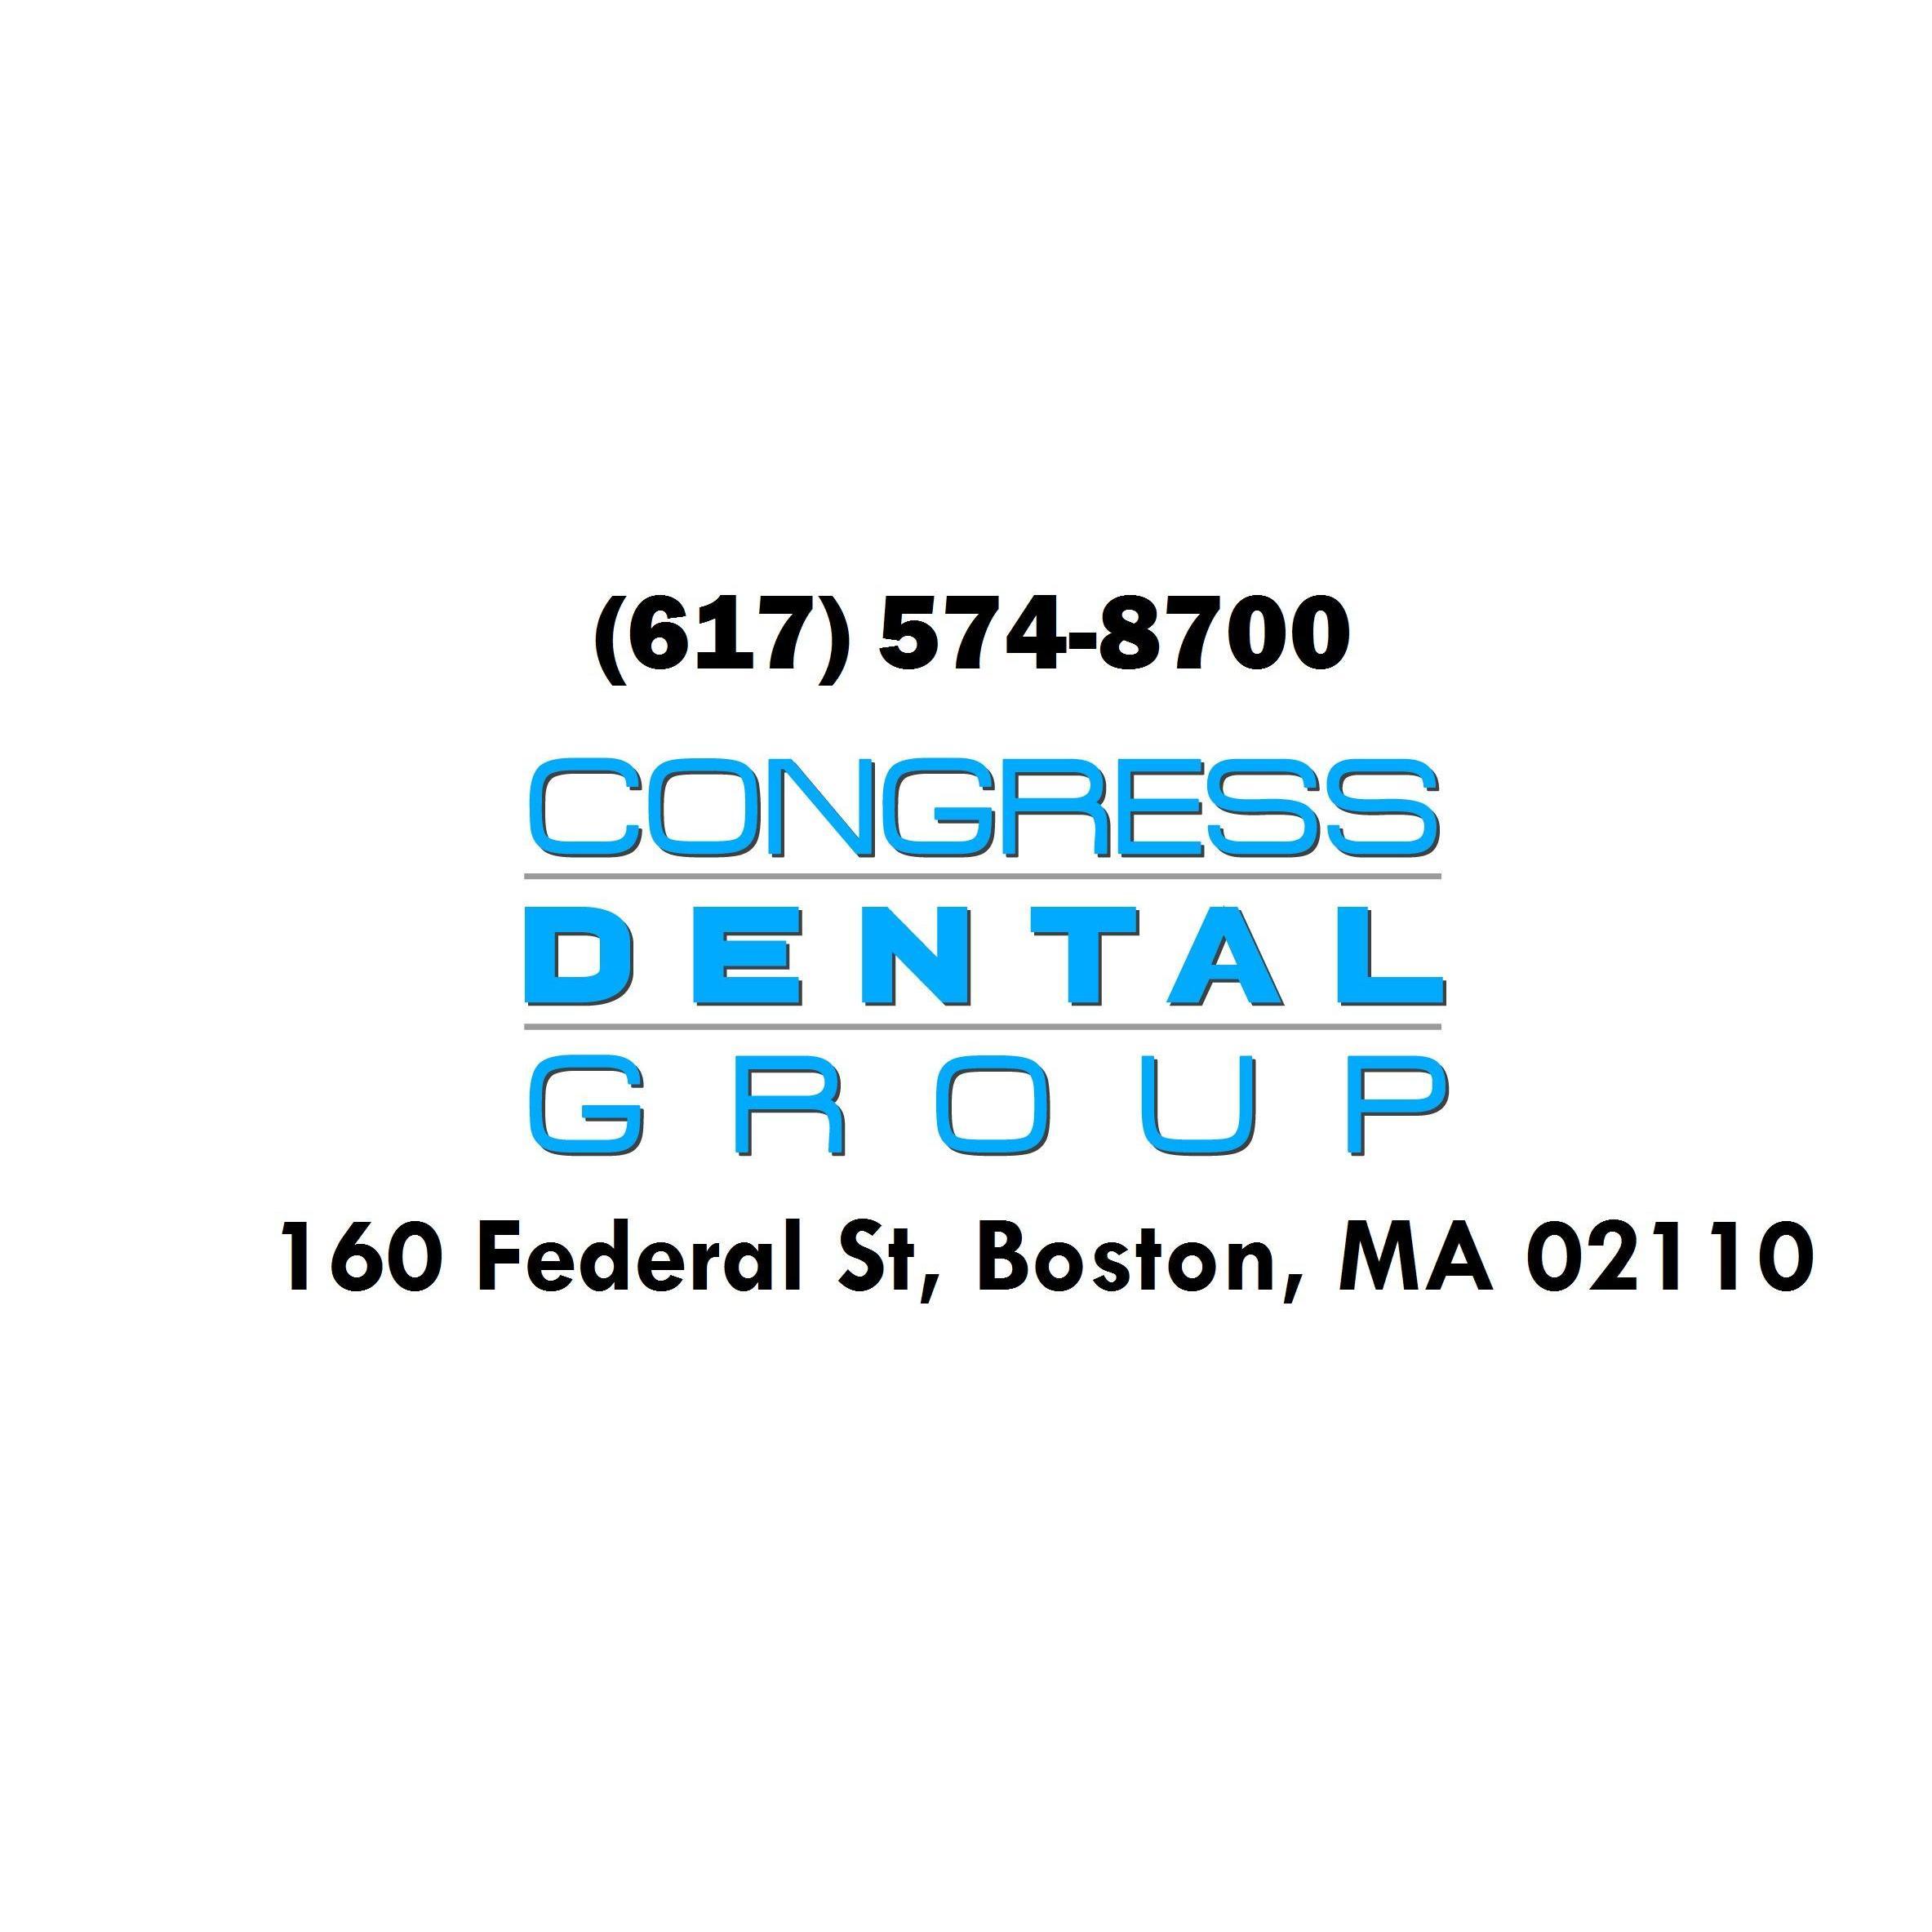 Congress Dental Group